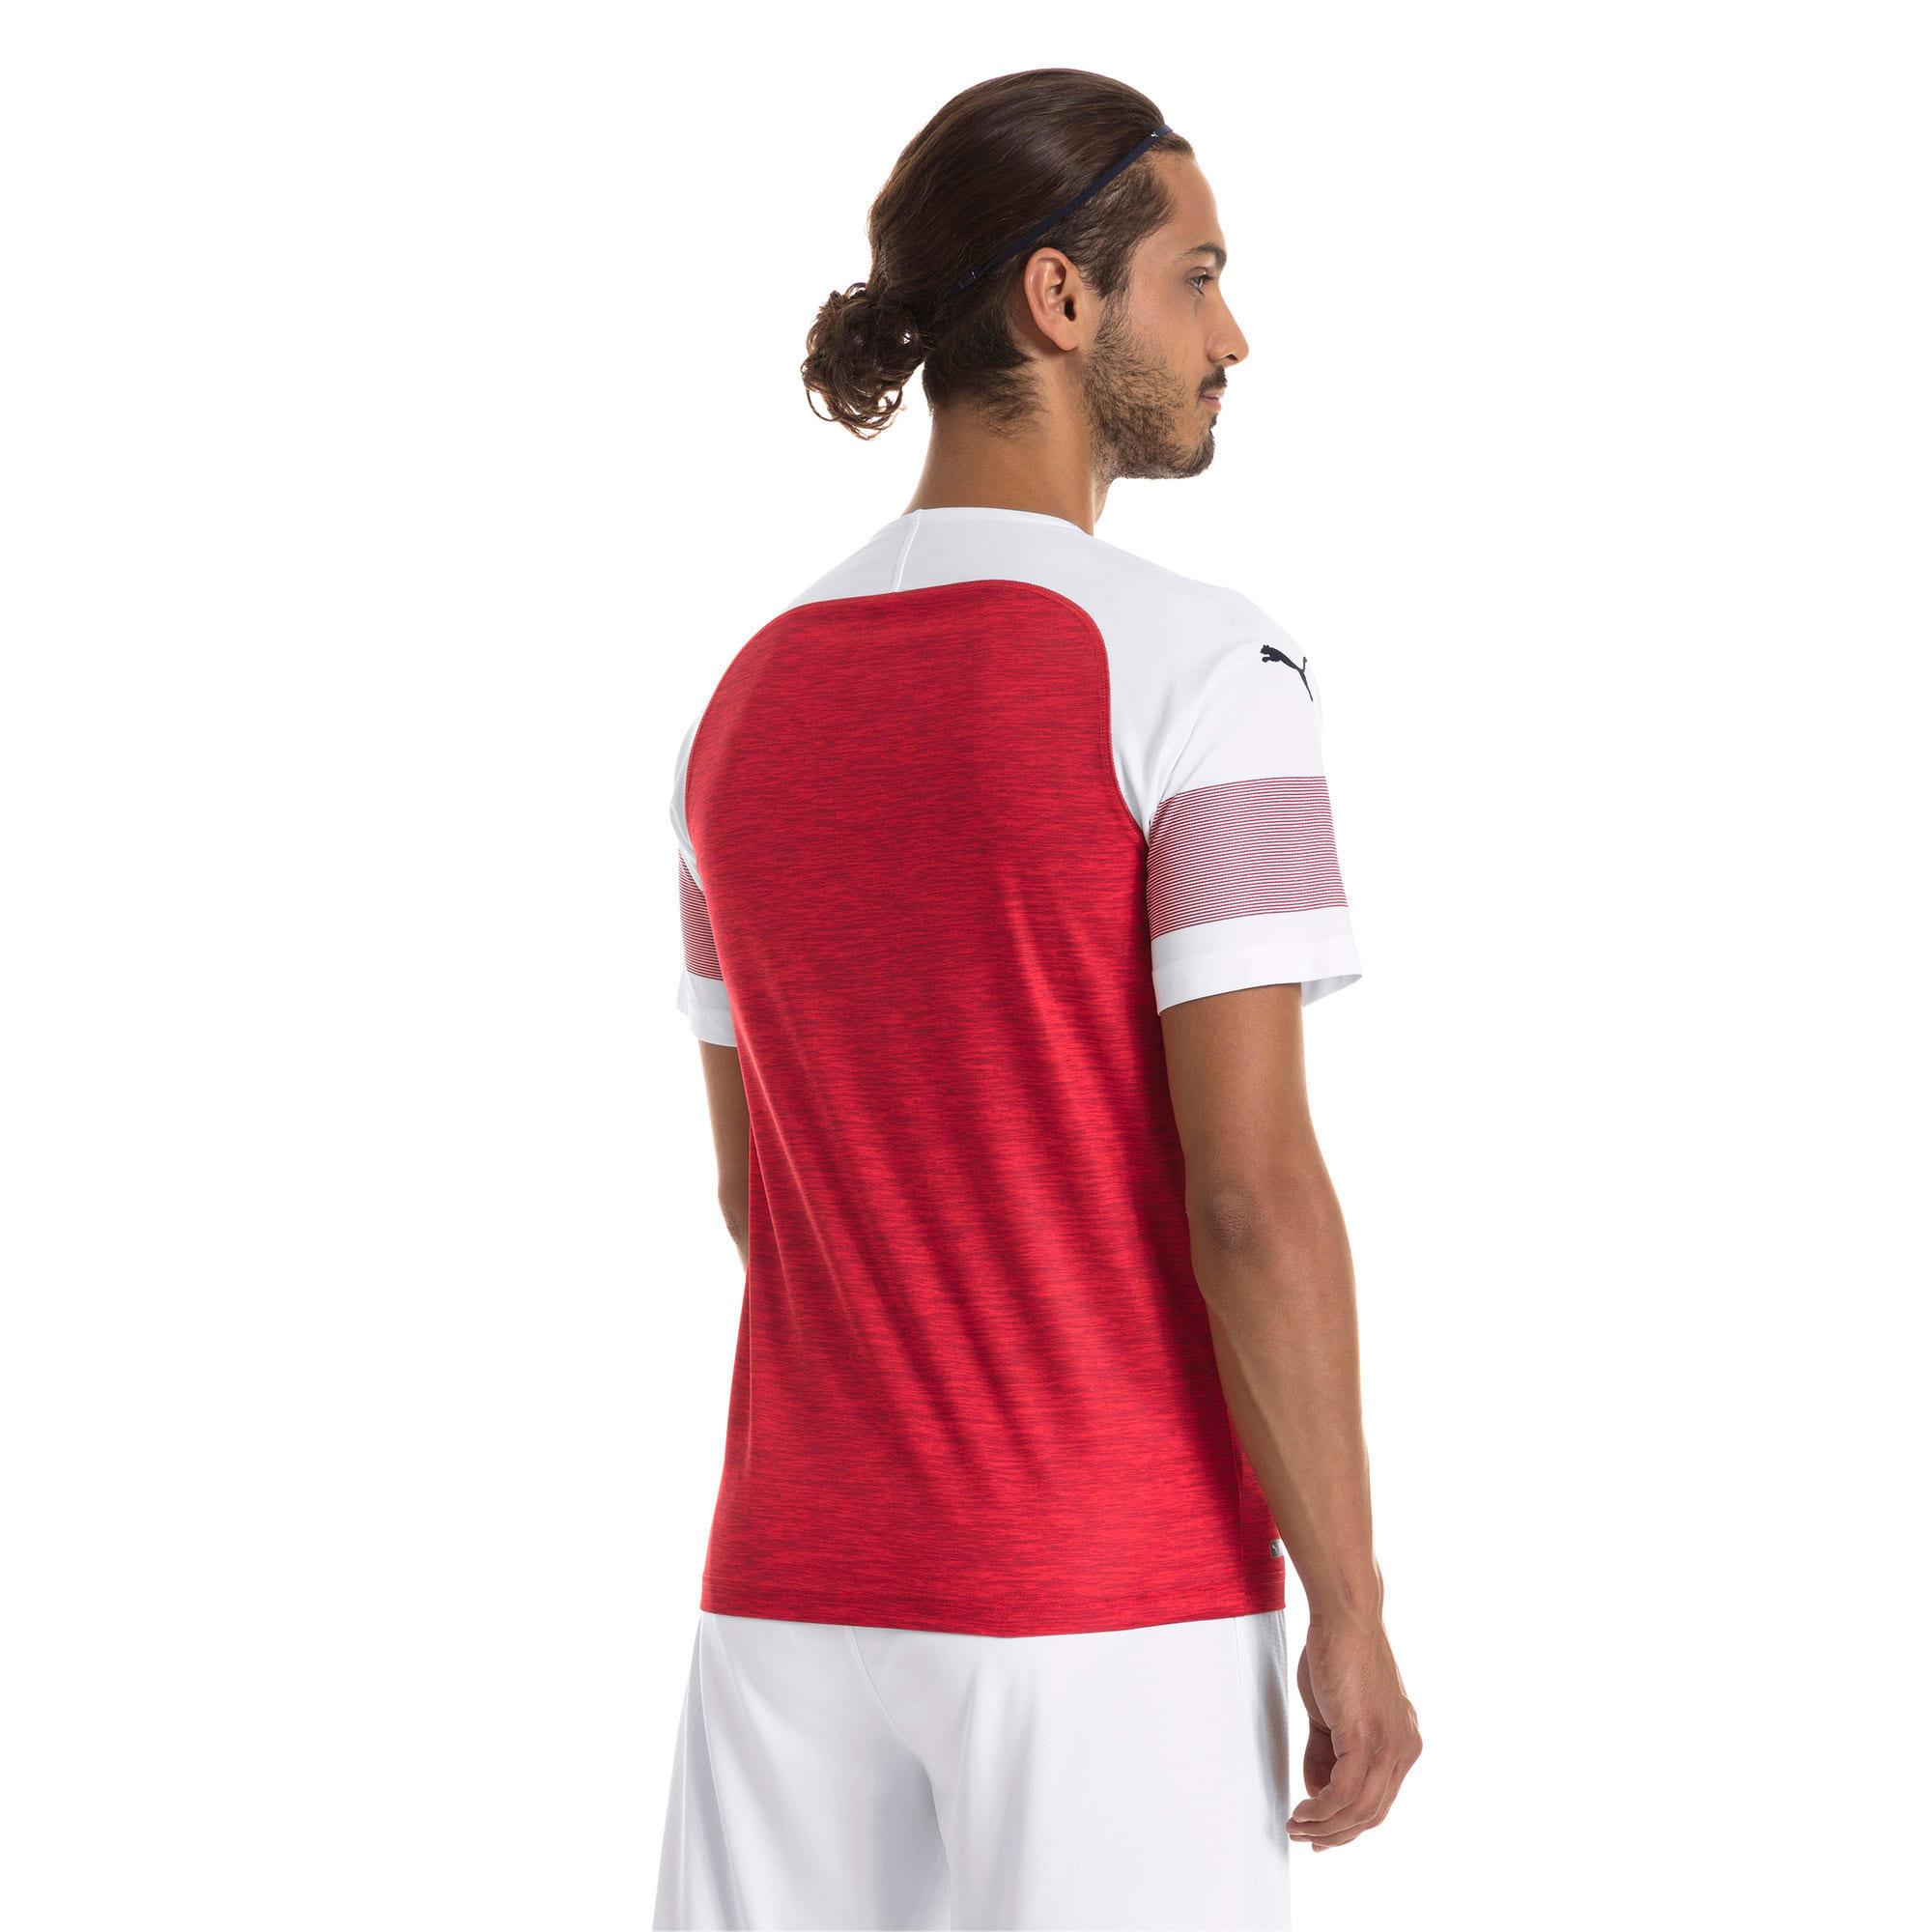 Thumbnail 2 of Arsenal 2018/19 Home Replica Jersey, -Chili Pepper Heather-White, medium